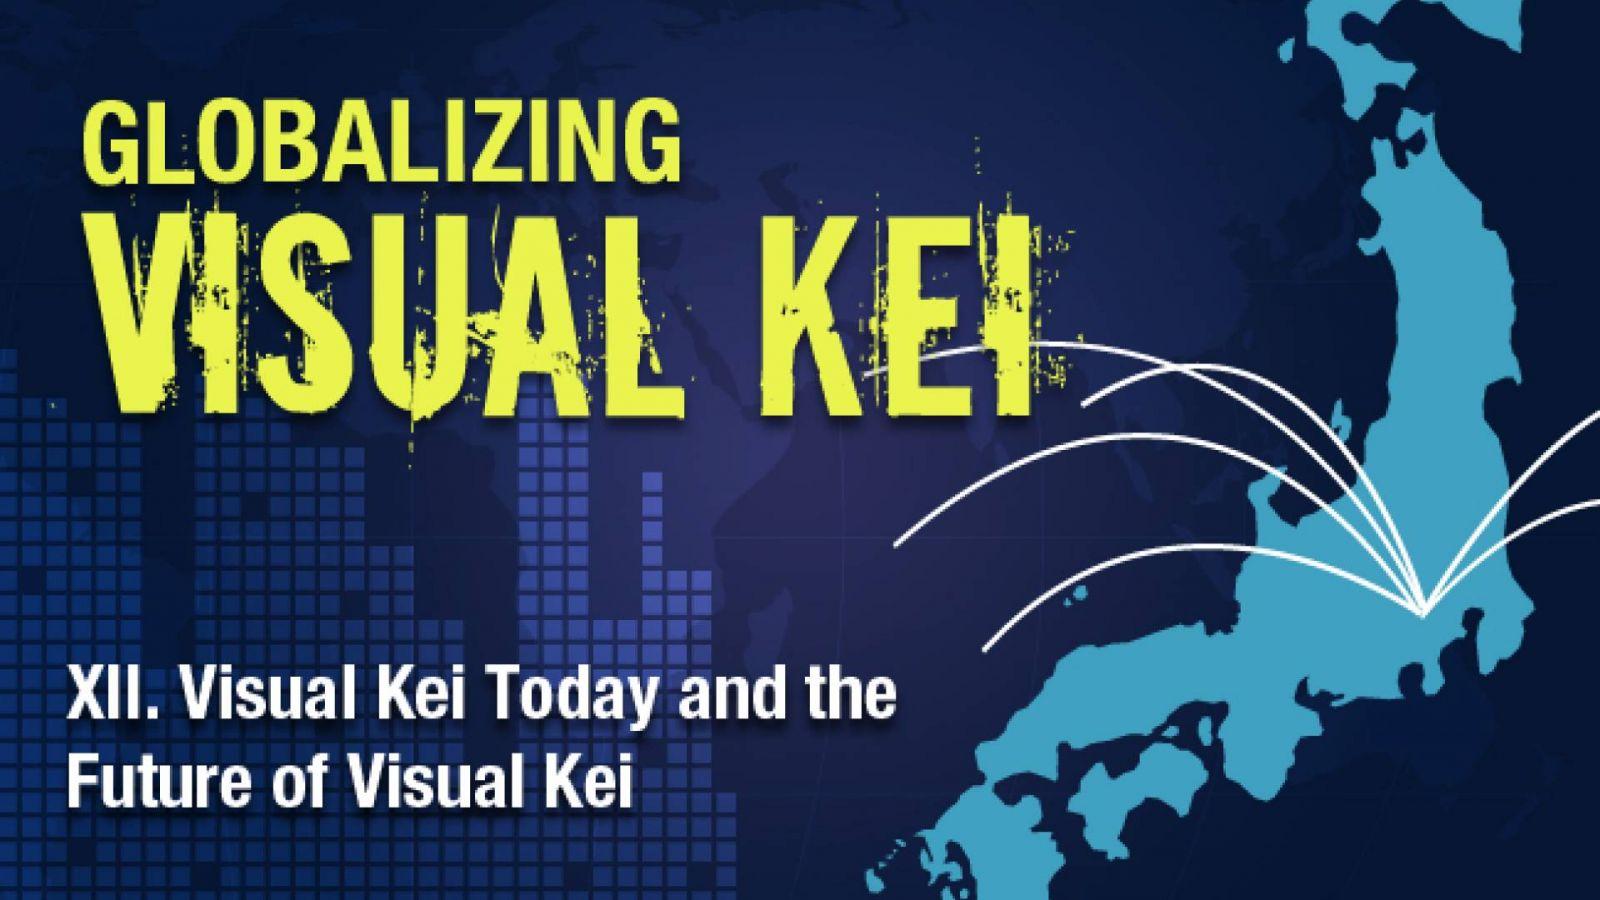 Globalizando o Visual Kei: O Visual Kei Hoje e o Futuro do Visual Kei © Lydia Michalitsianos